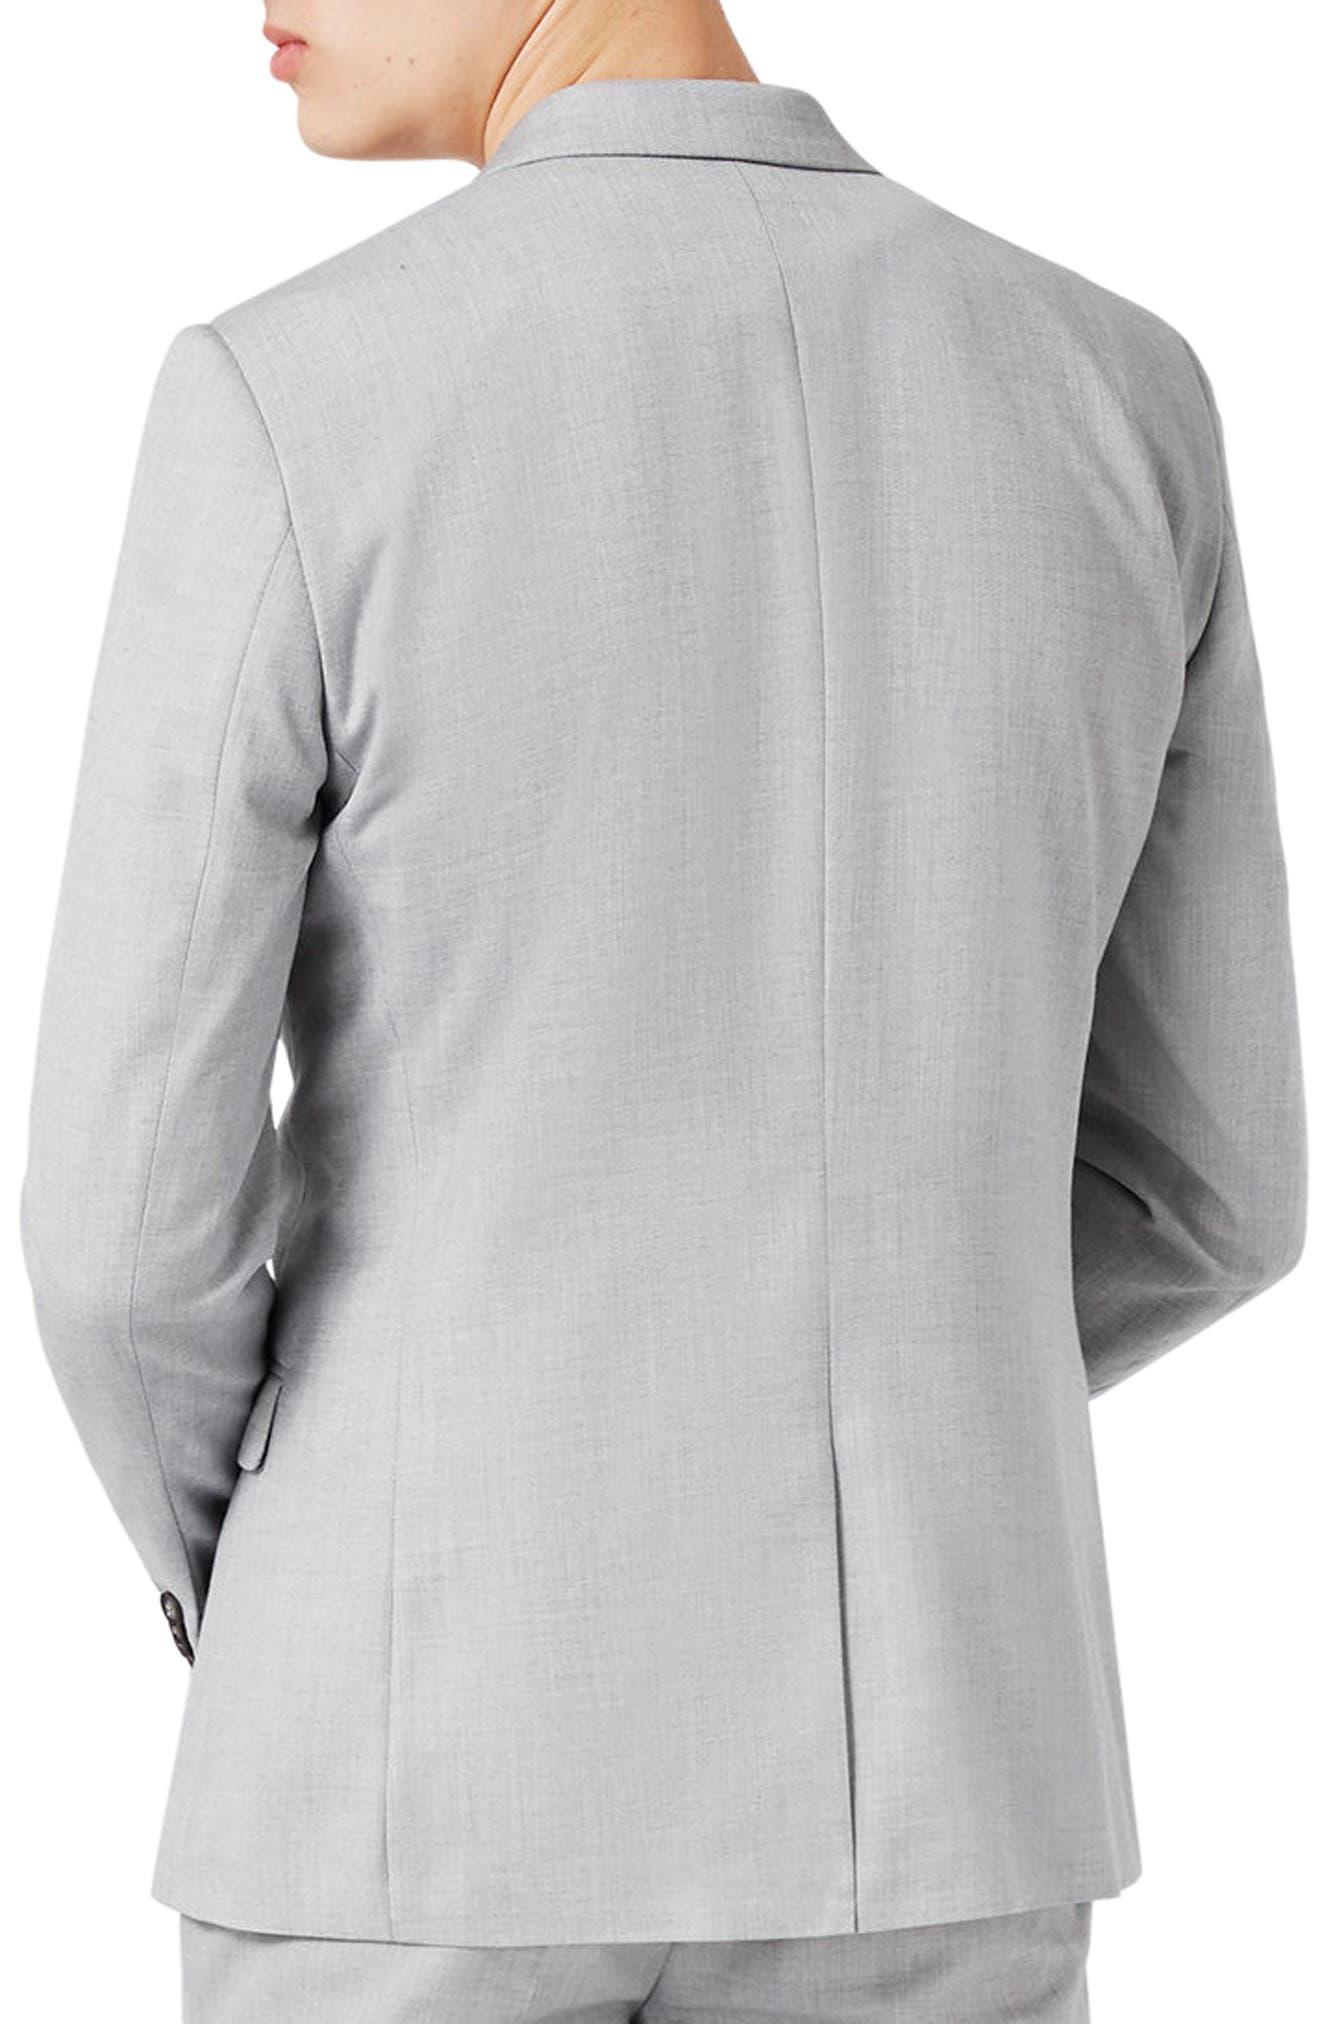 Skinny Fit Crosshatch Suit Jacket,                             Alternate thumbnail 2, color,                             020